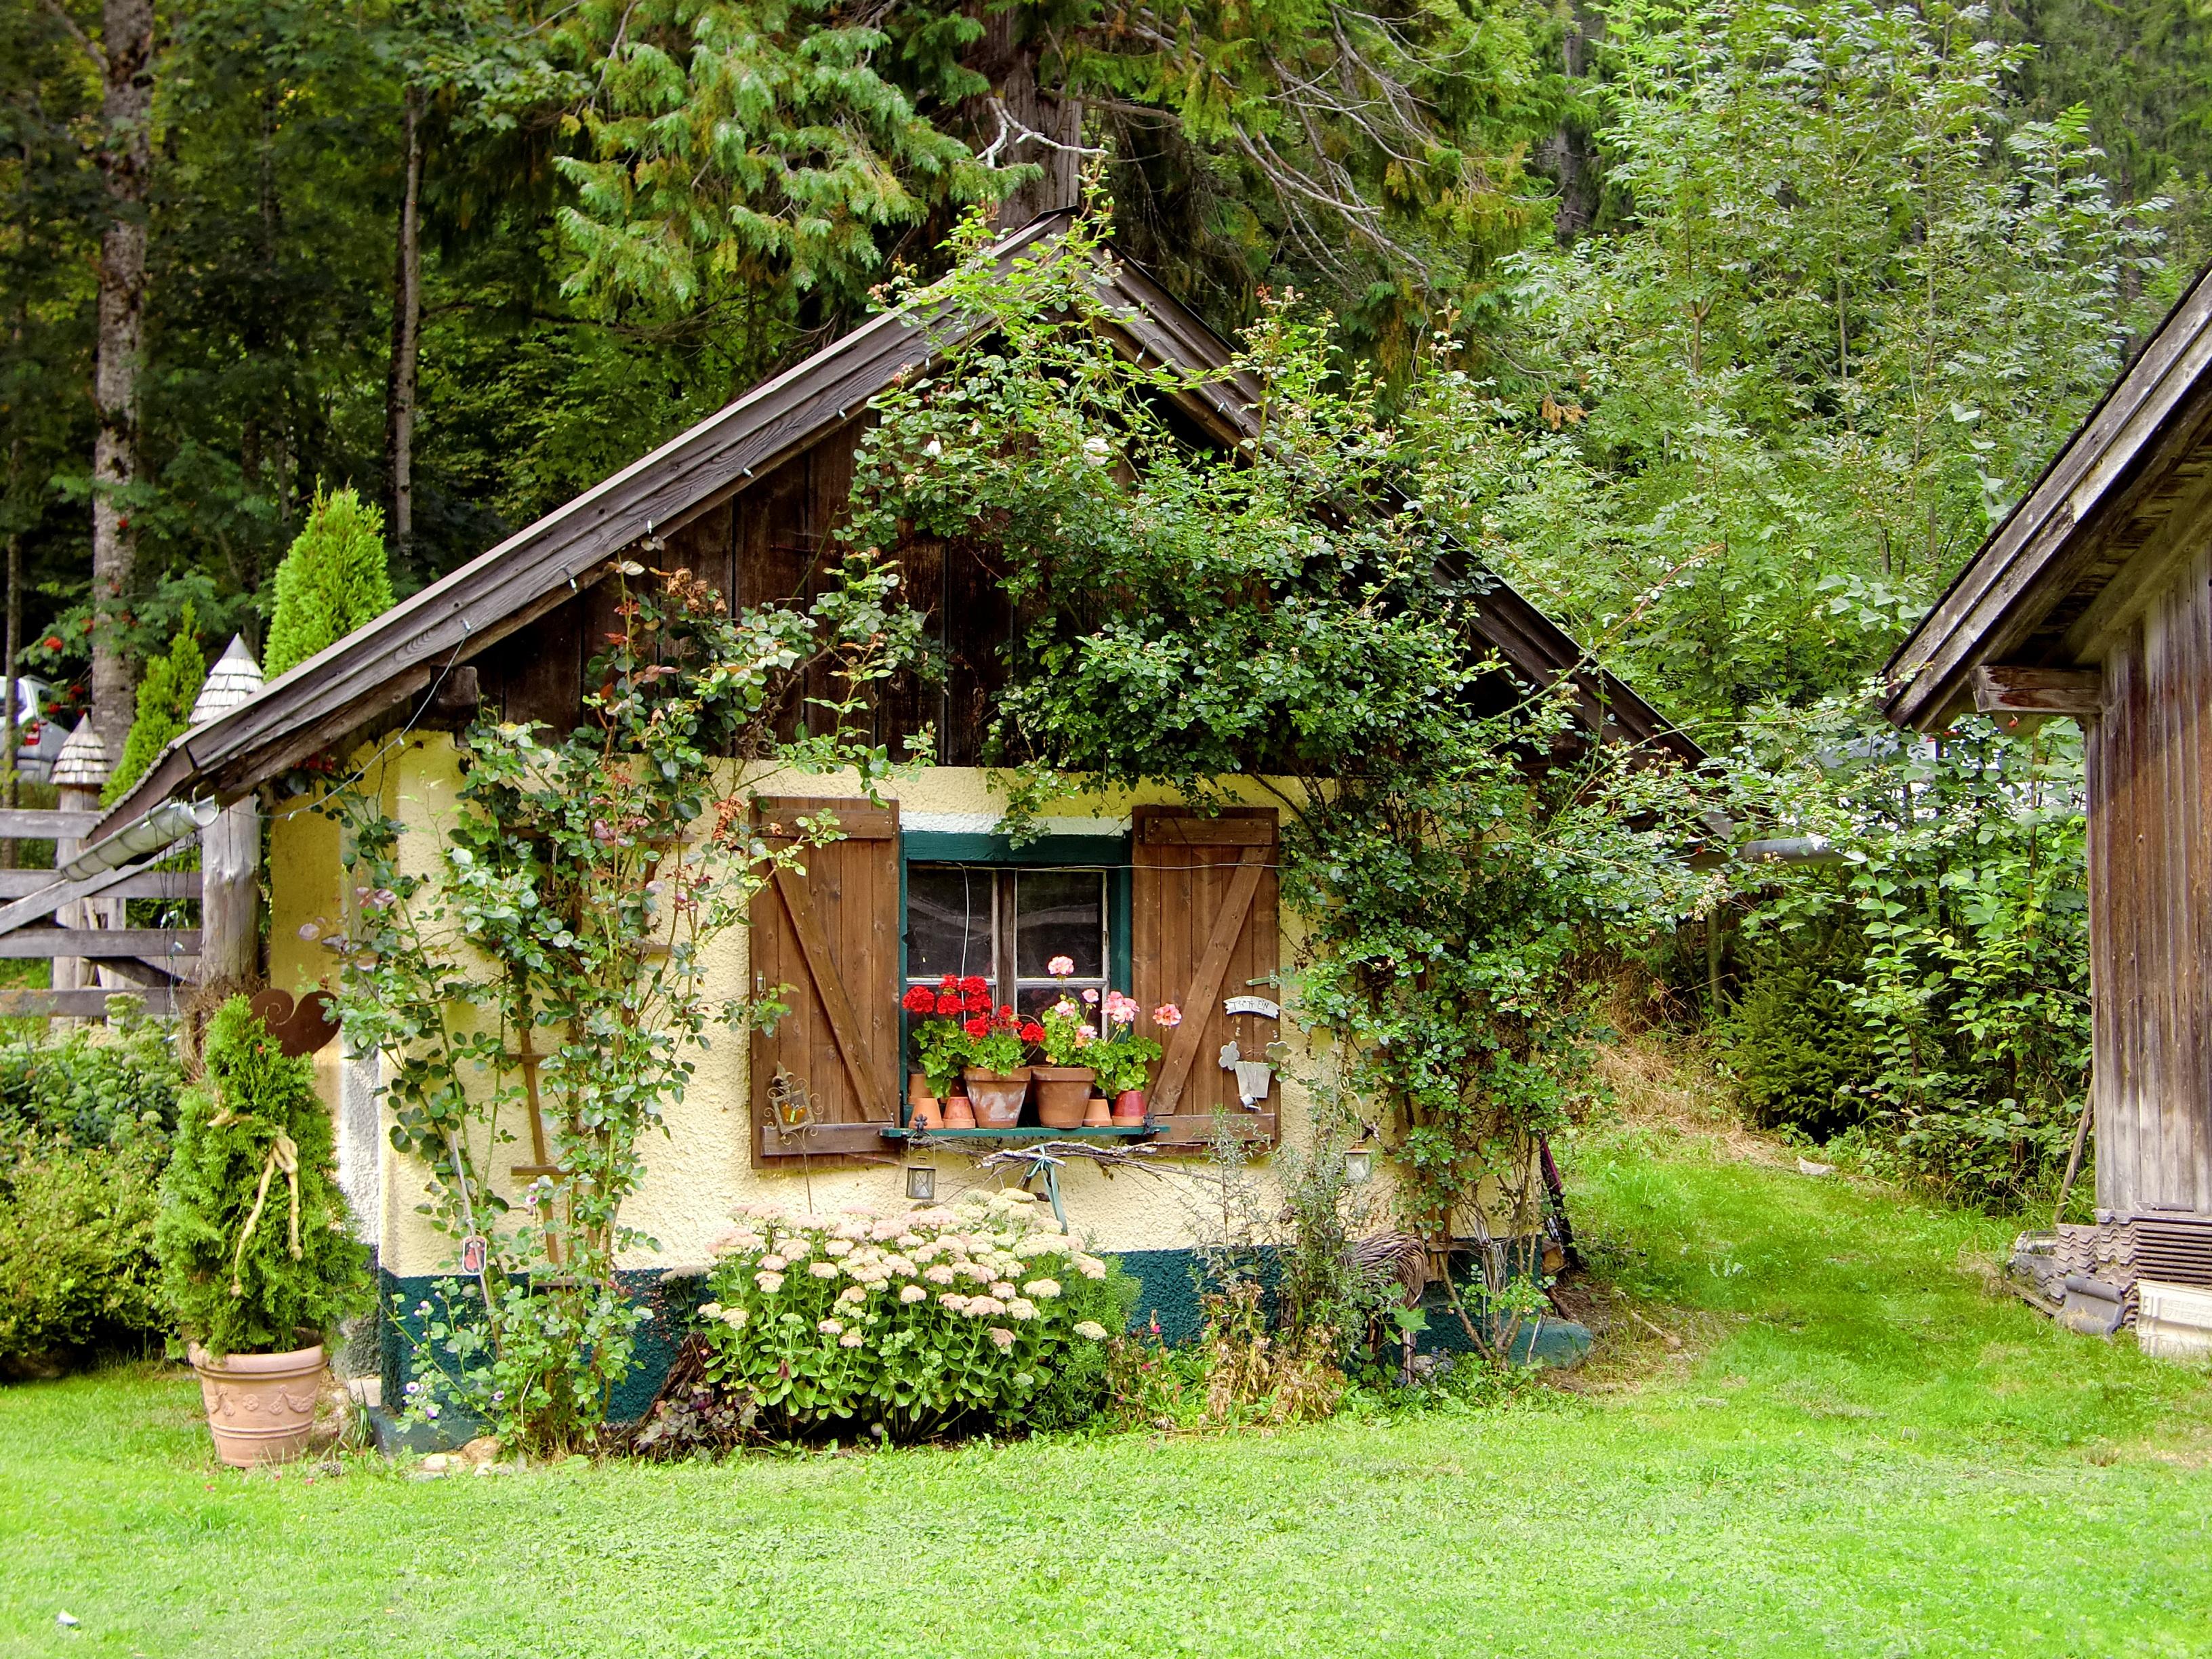 free images tree flower building home hut village jungle